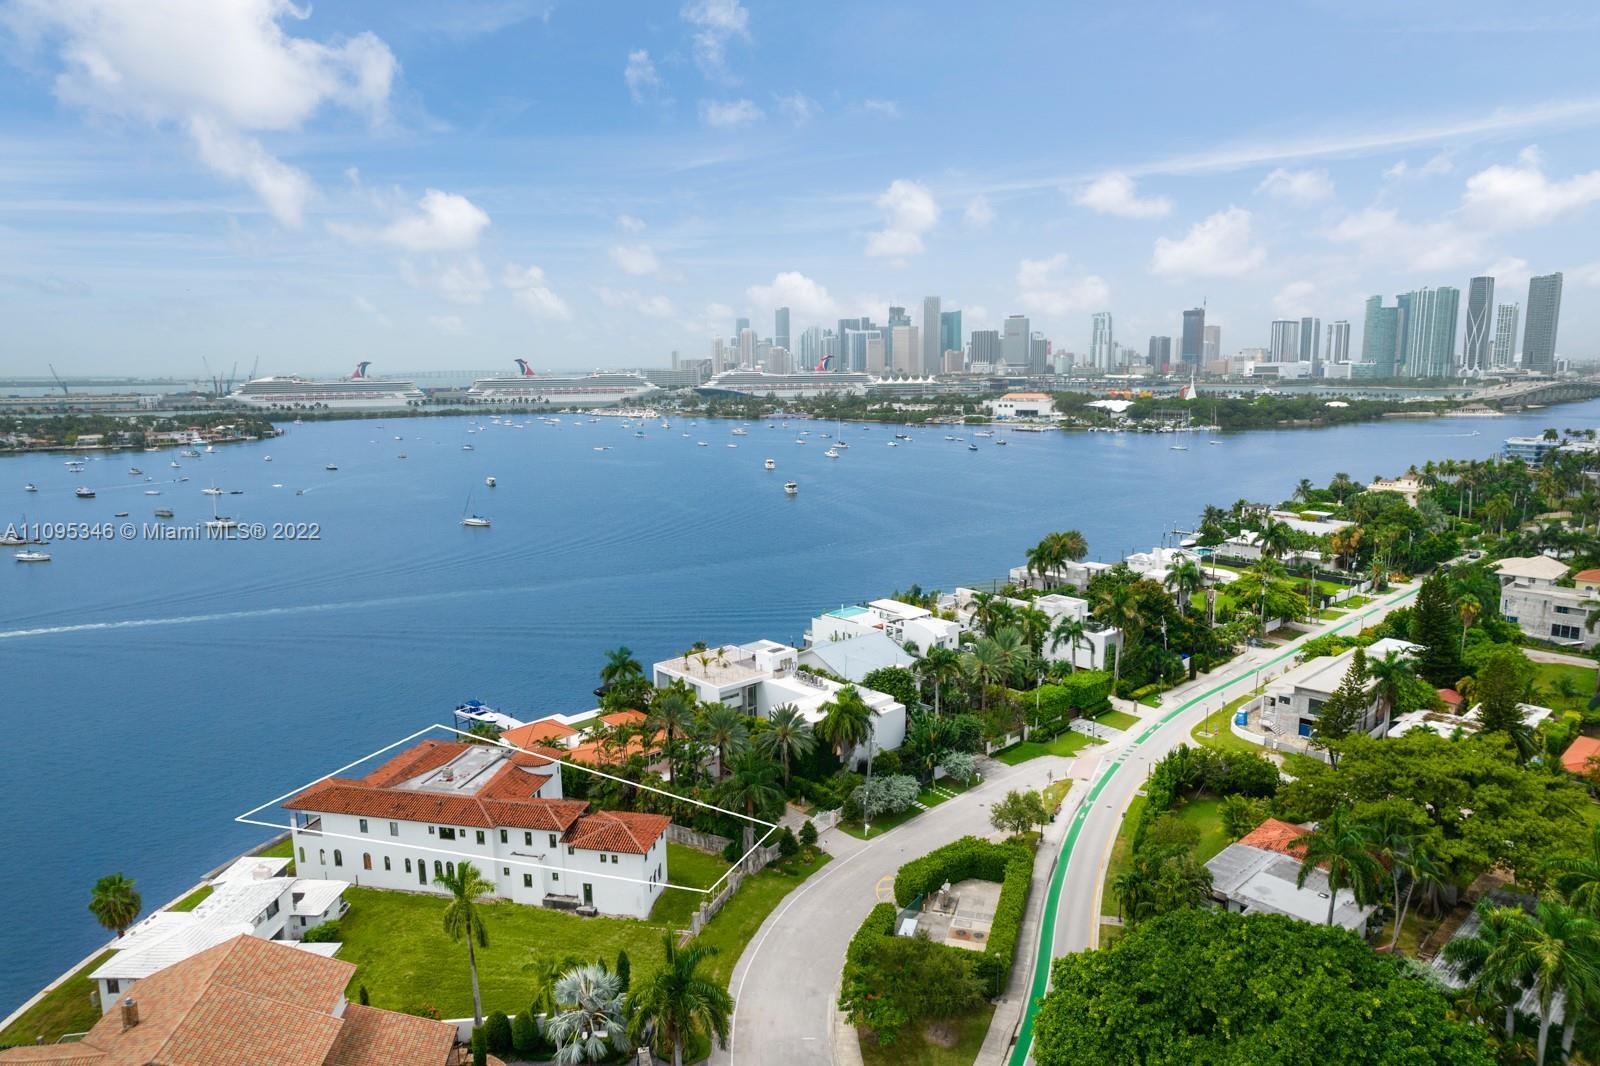 1384 Venetian Way, Miami, Florida 33139